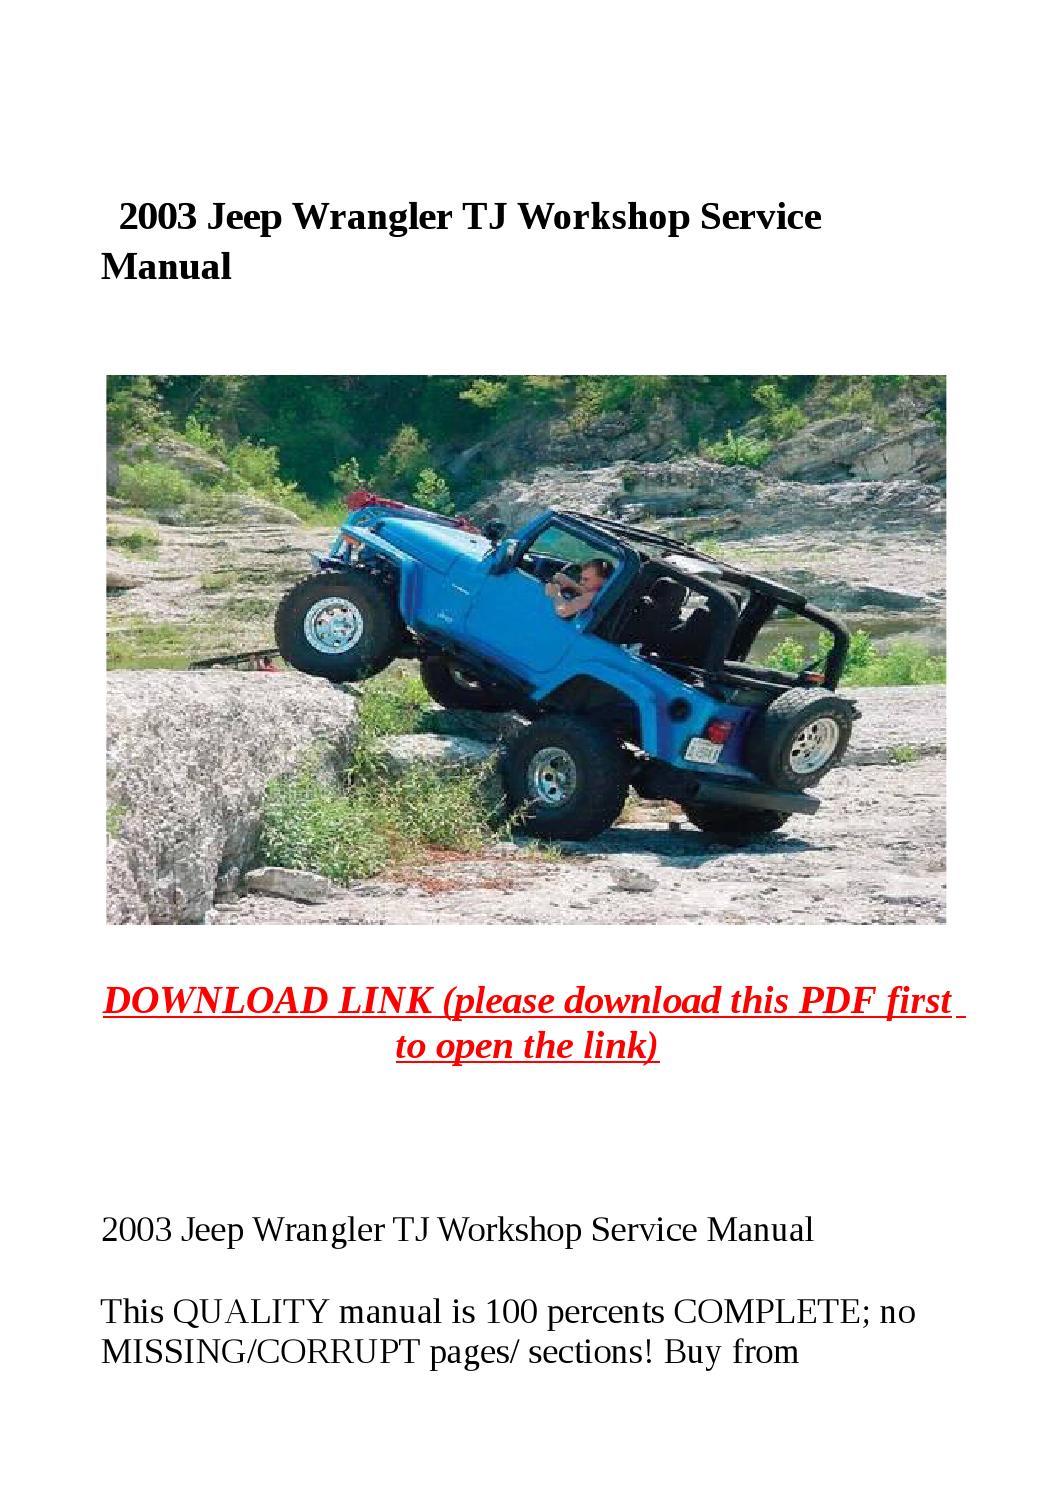 2003 Jeep Wrangler Tj Workshop Service Manual By Dora Tang Issuu